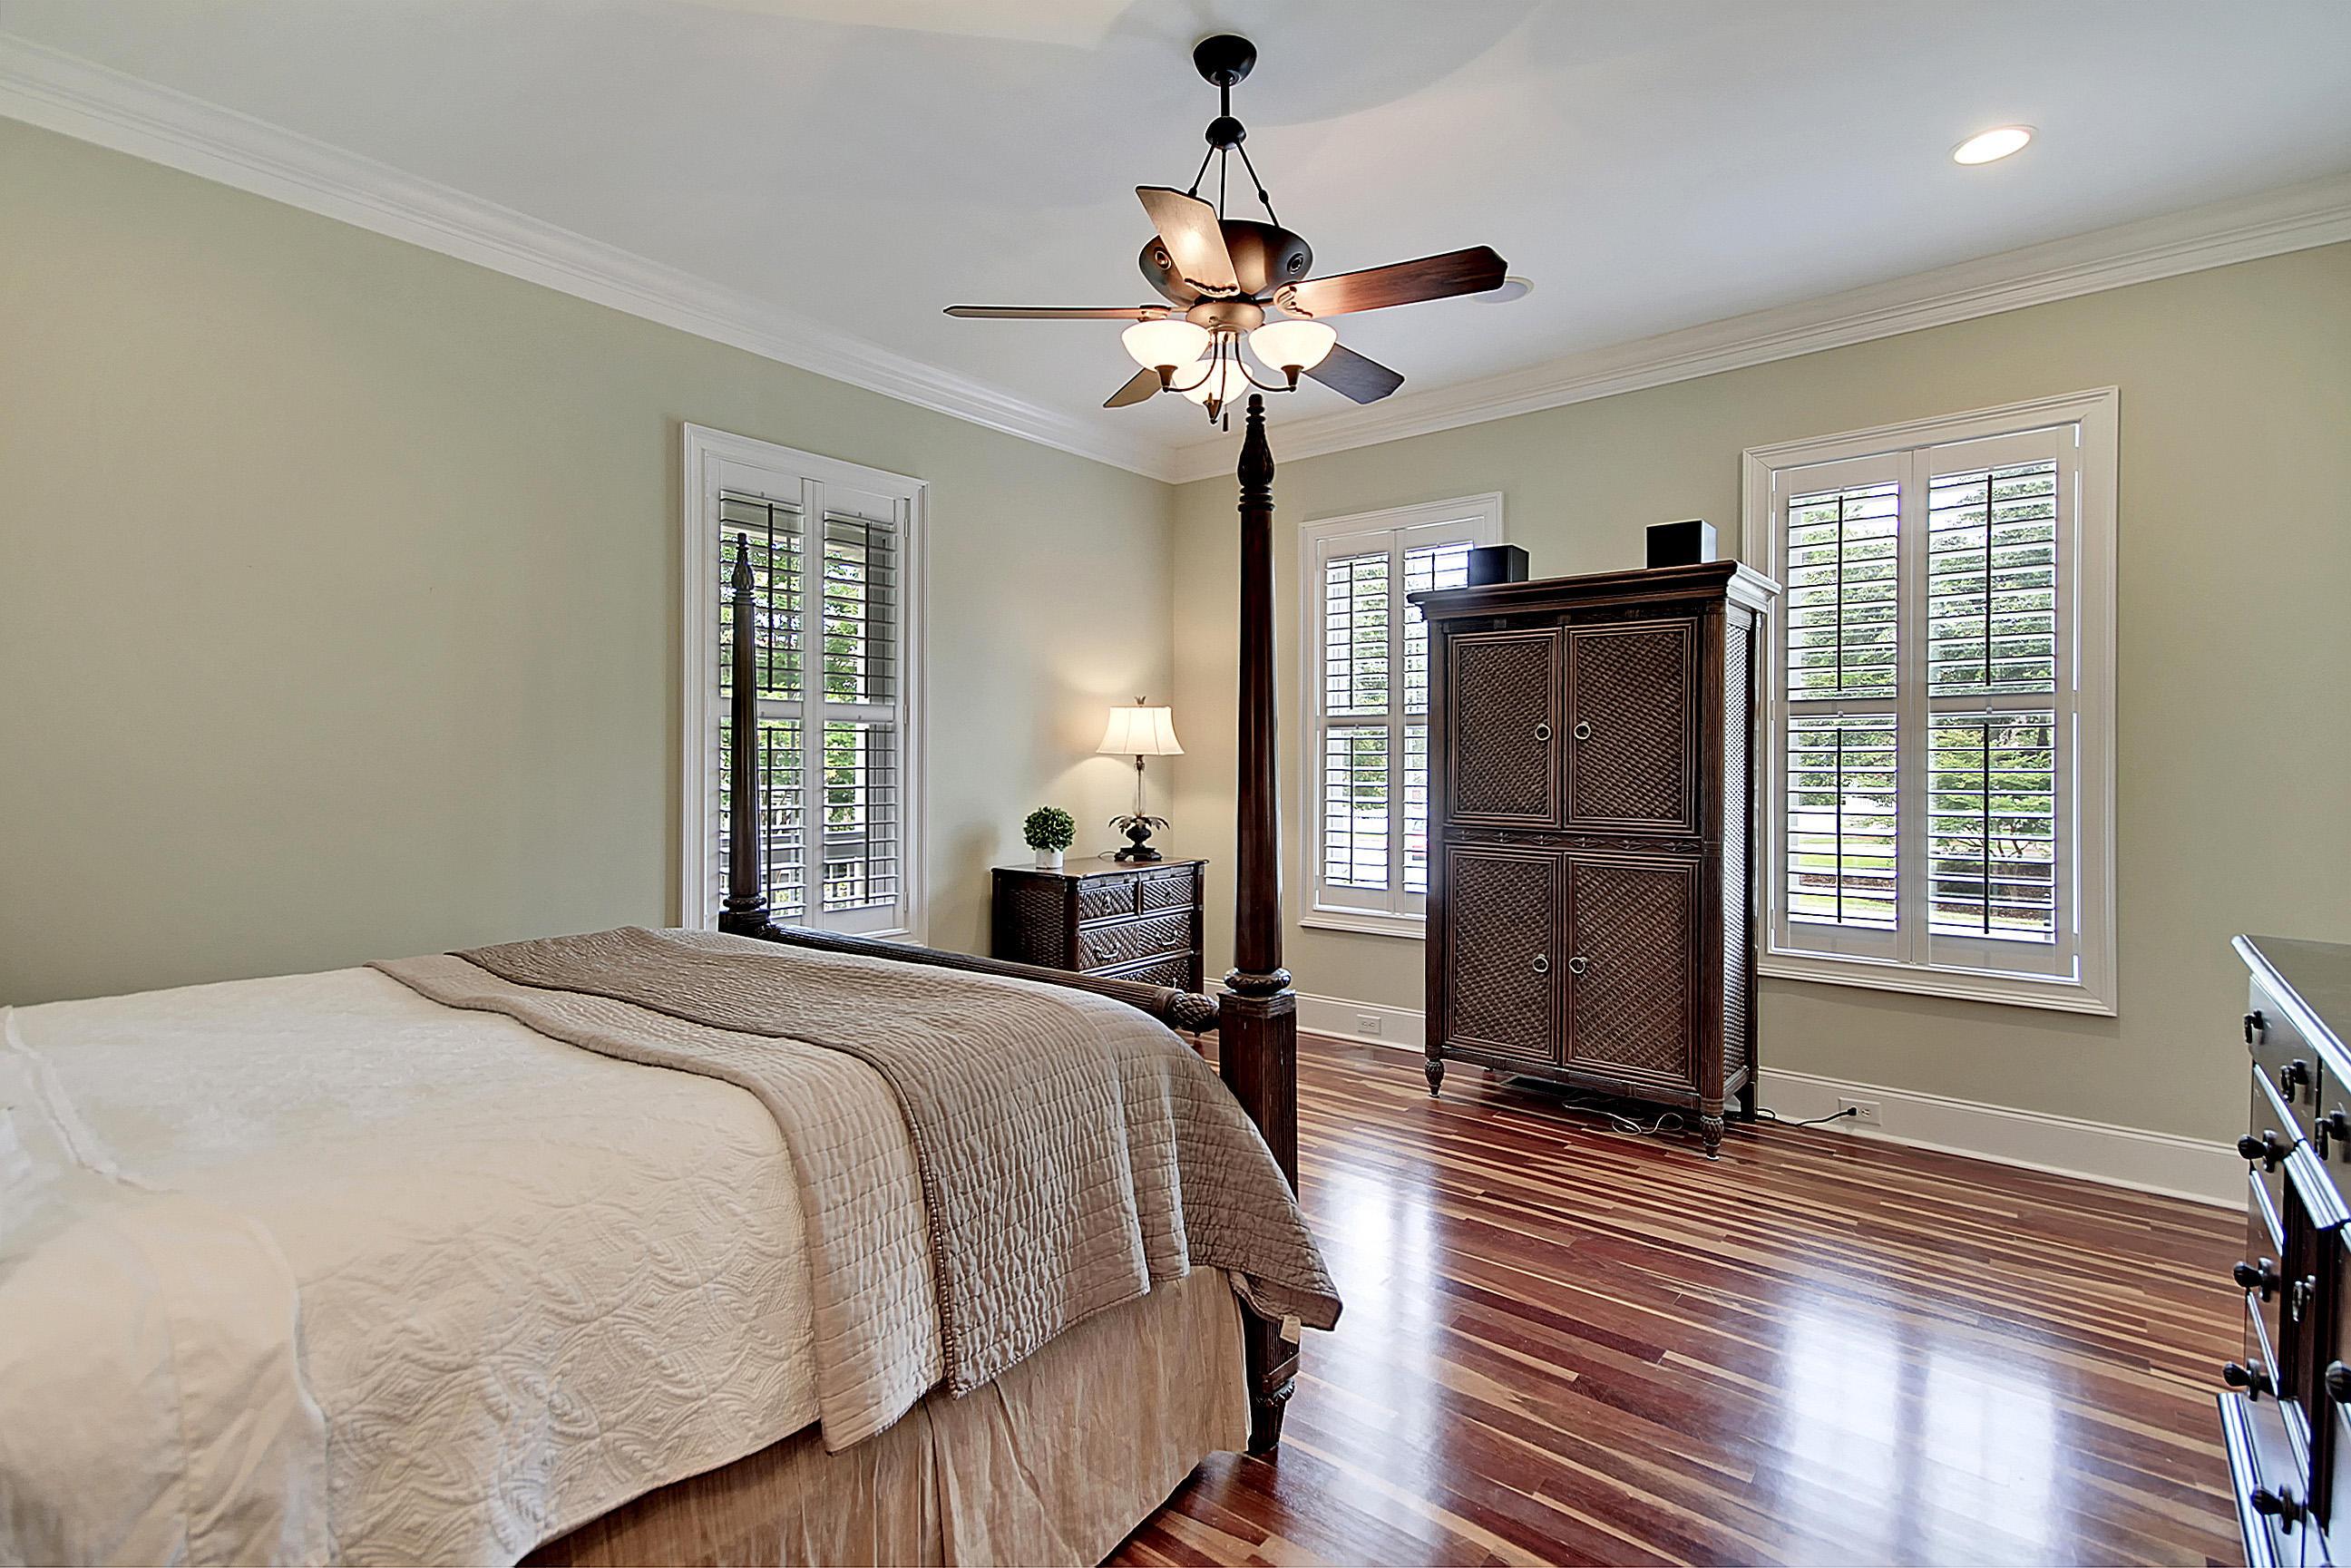 Belle Hall Homes For Sale - 368 Evian, Mount Pleasant, SC - 16